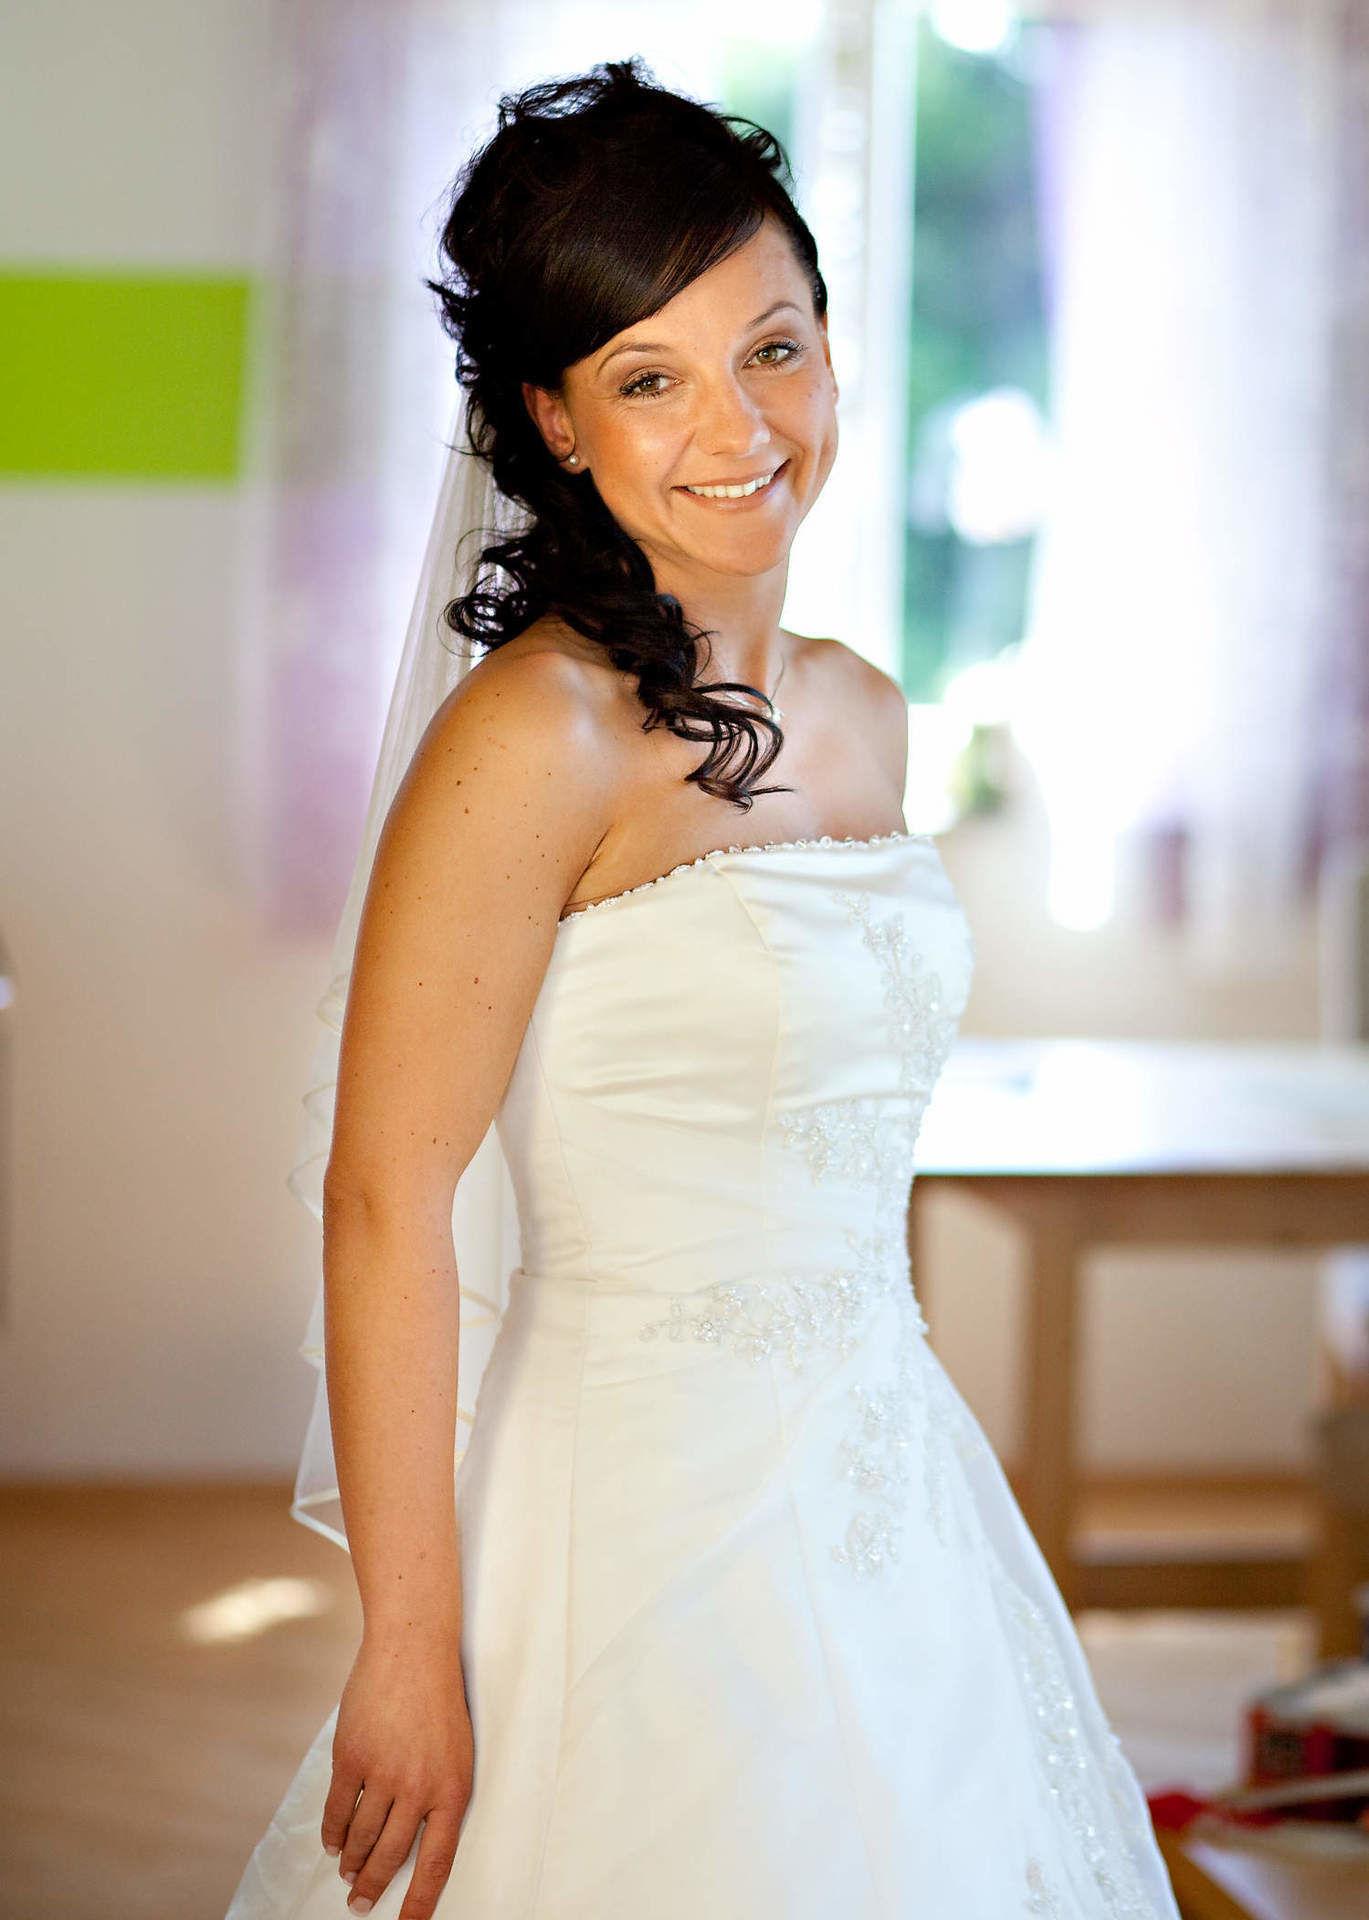 Brautkleid mieten graz